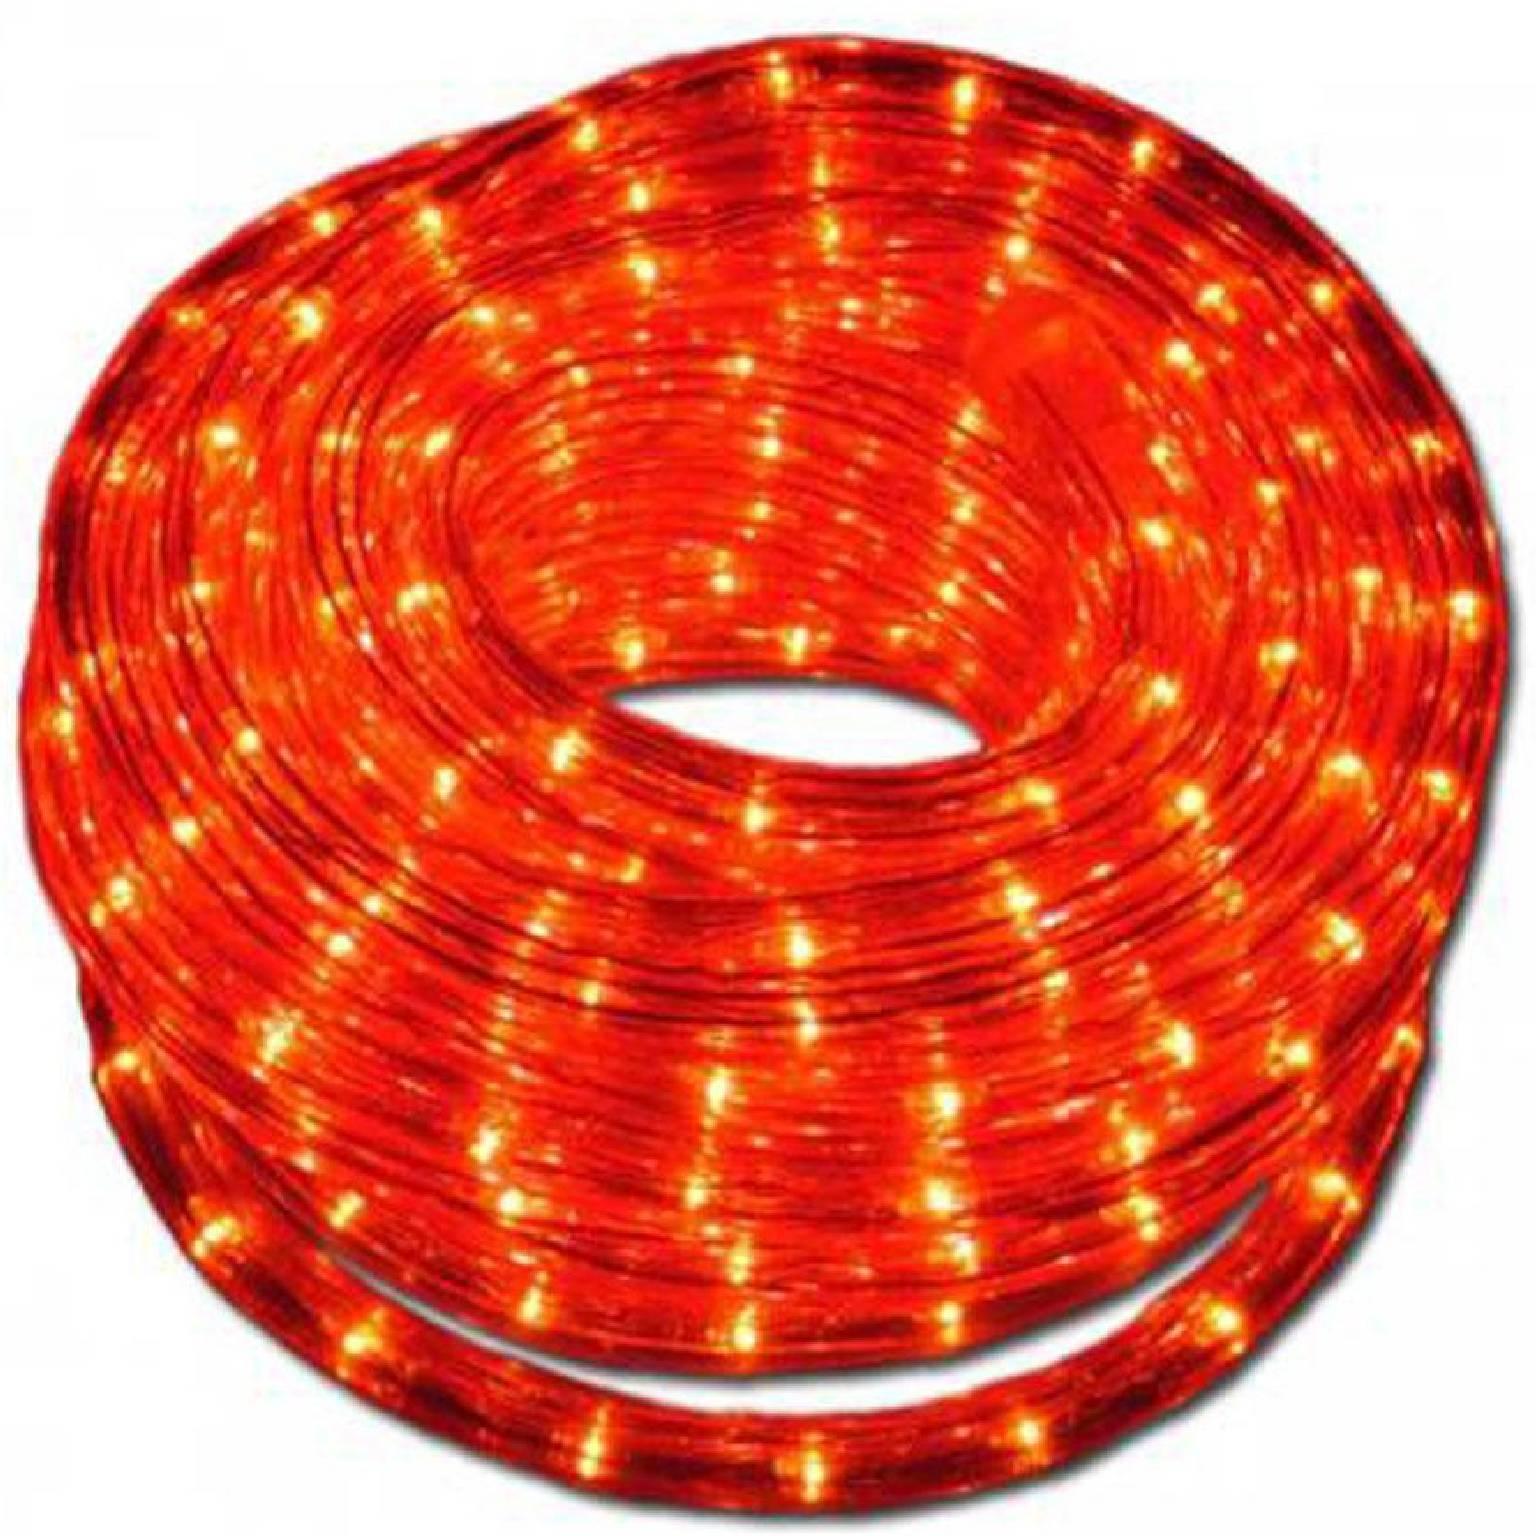 Afbeelding van Lichtslang 12 meter Rood Christmas gifts